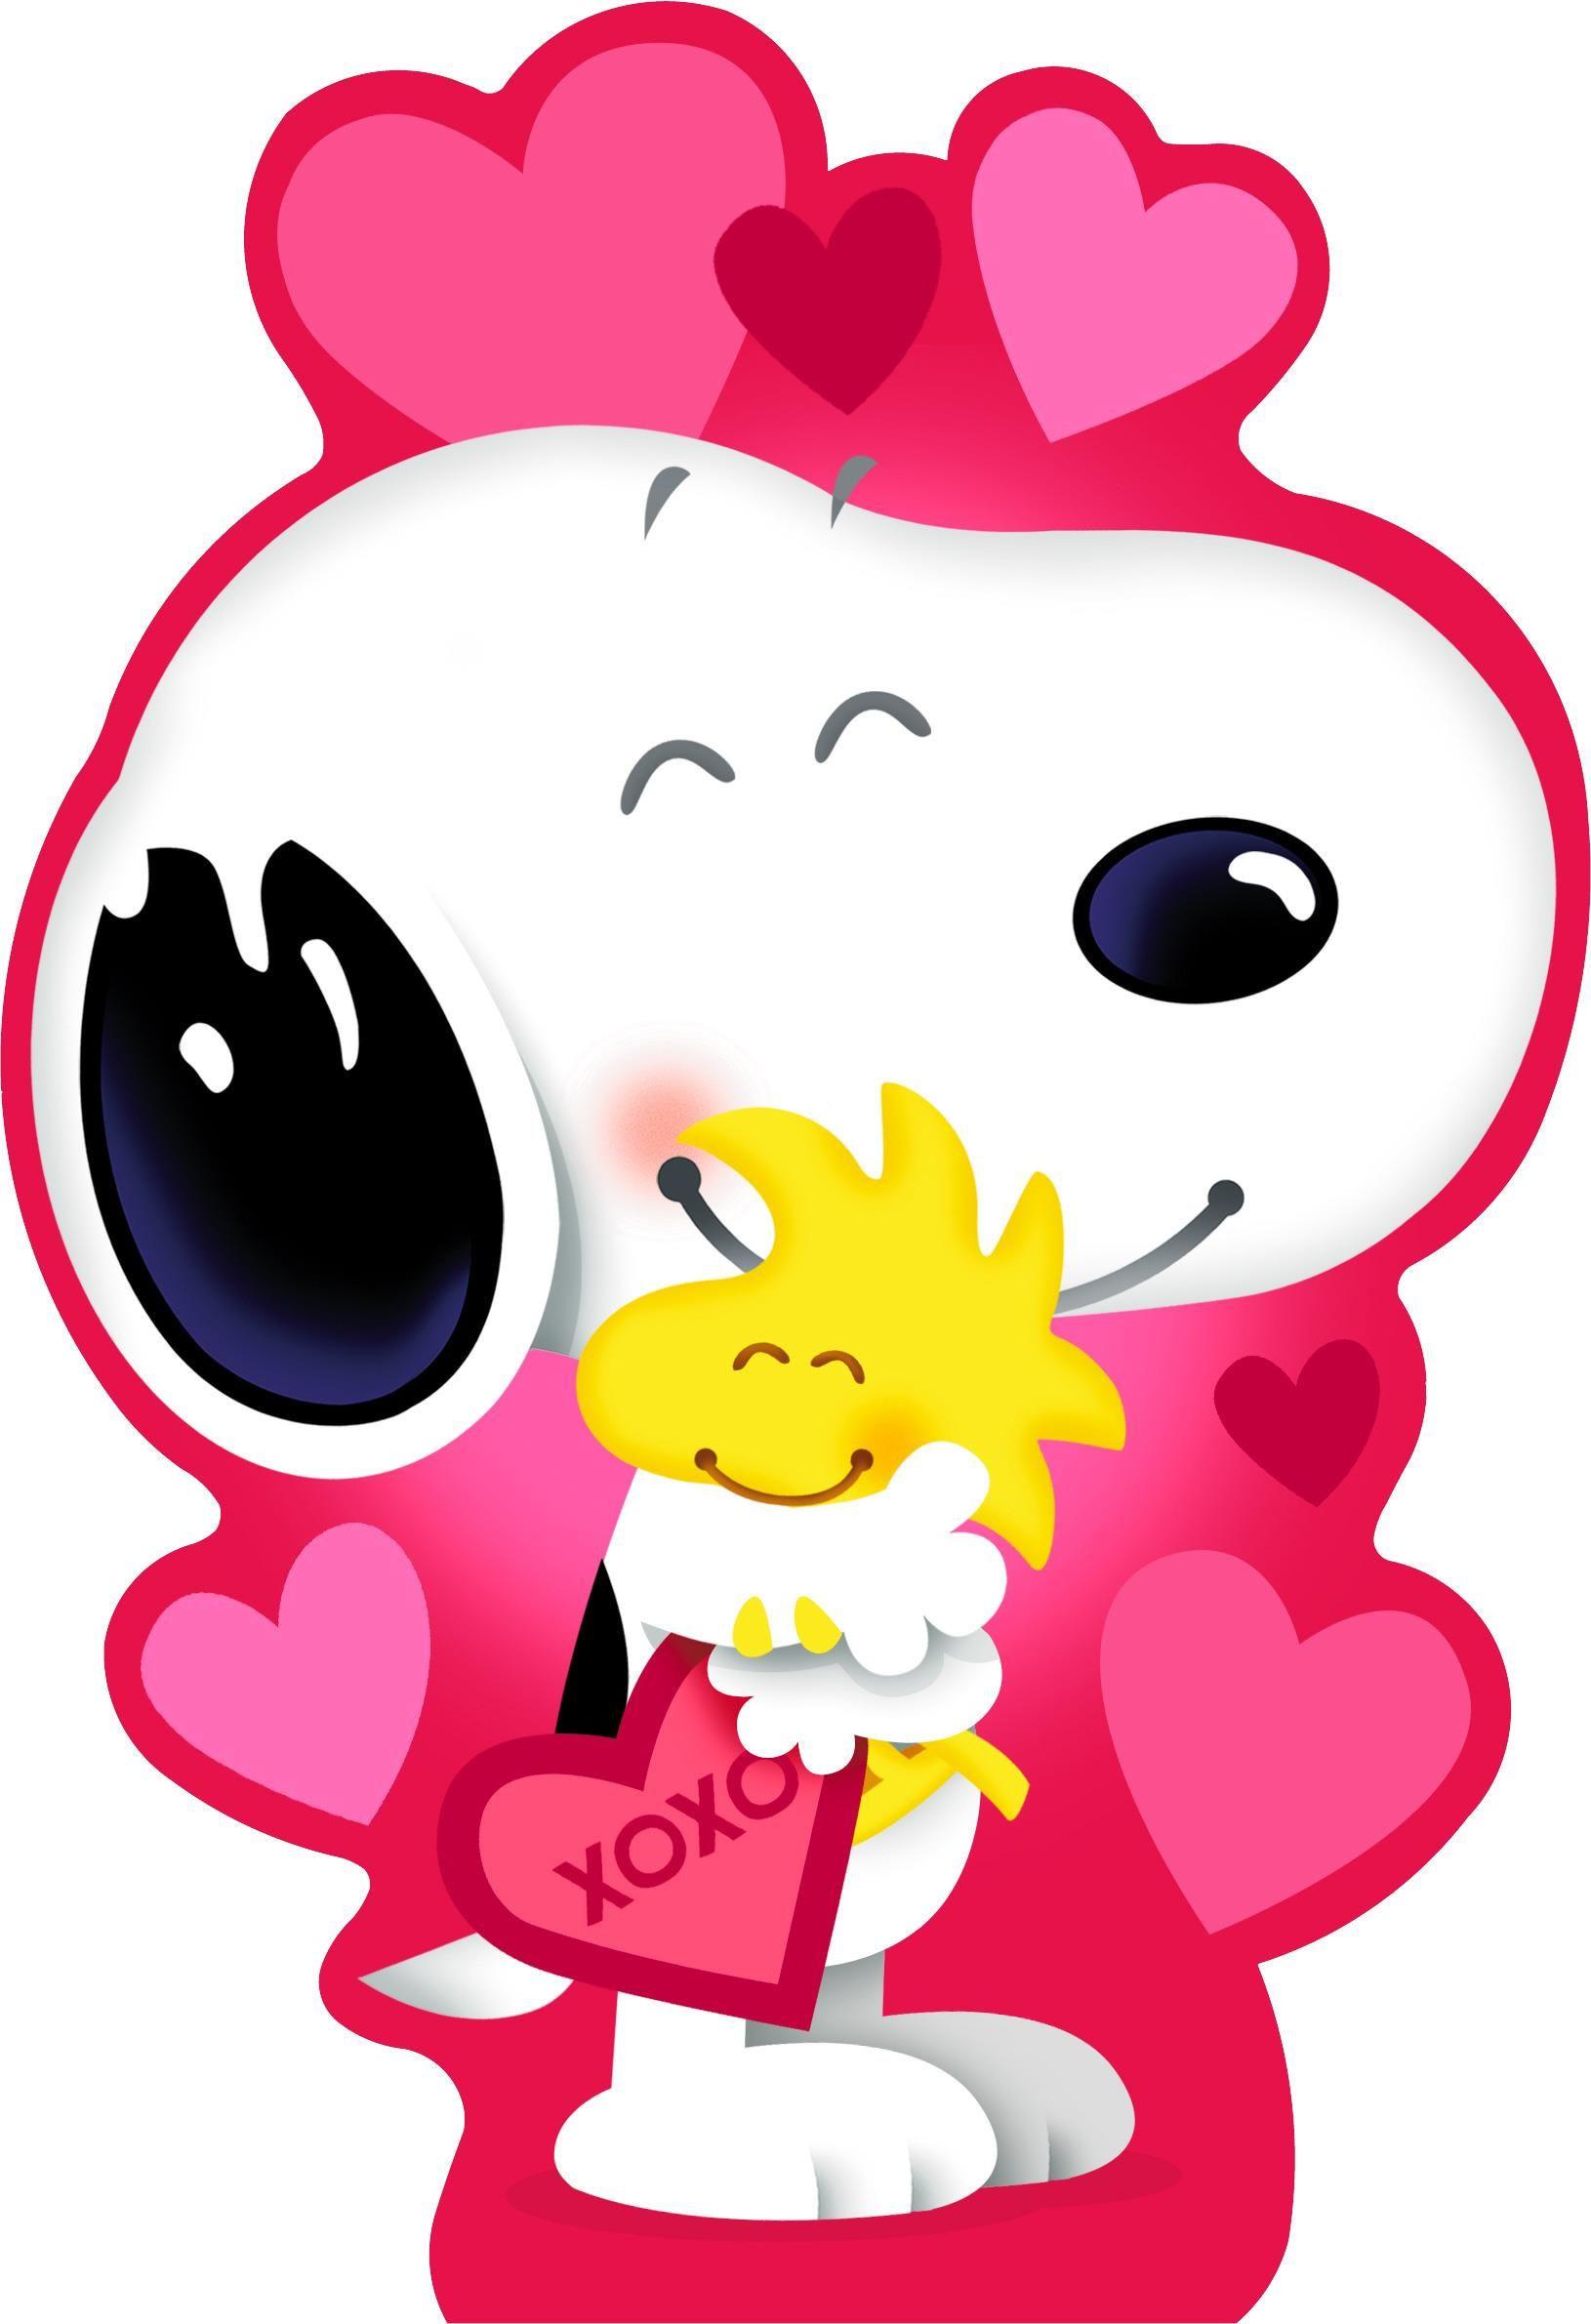 Snoopy Valentine's Day Cards by BradSnoopy97 Snoopy Valentine's Day Cards  by BradSnoopy97